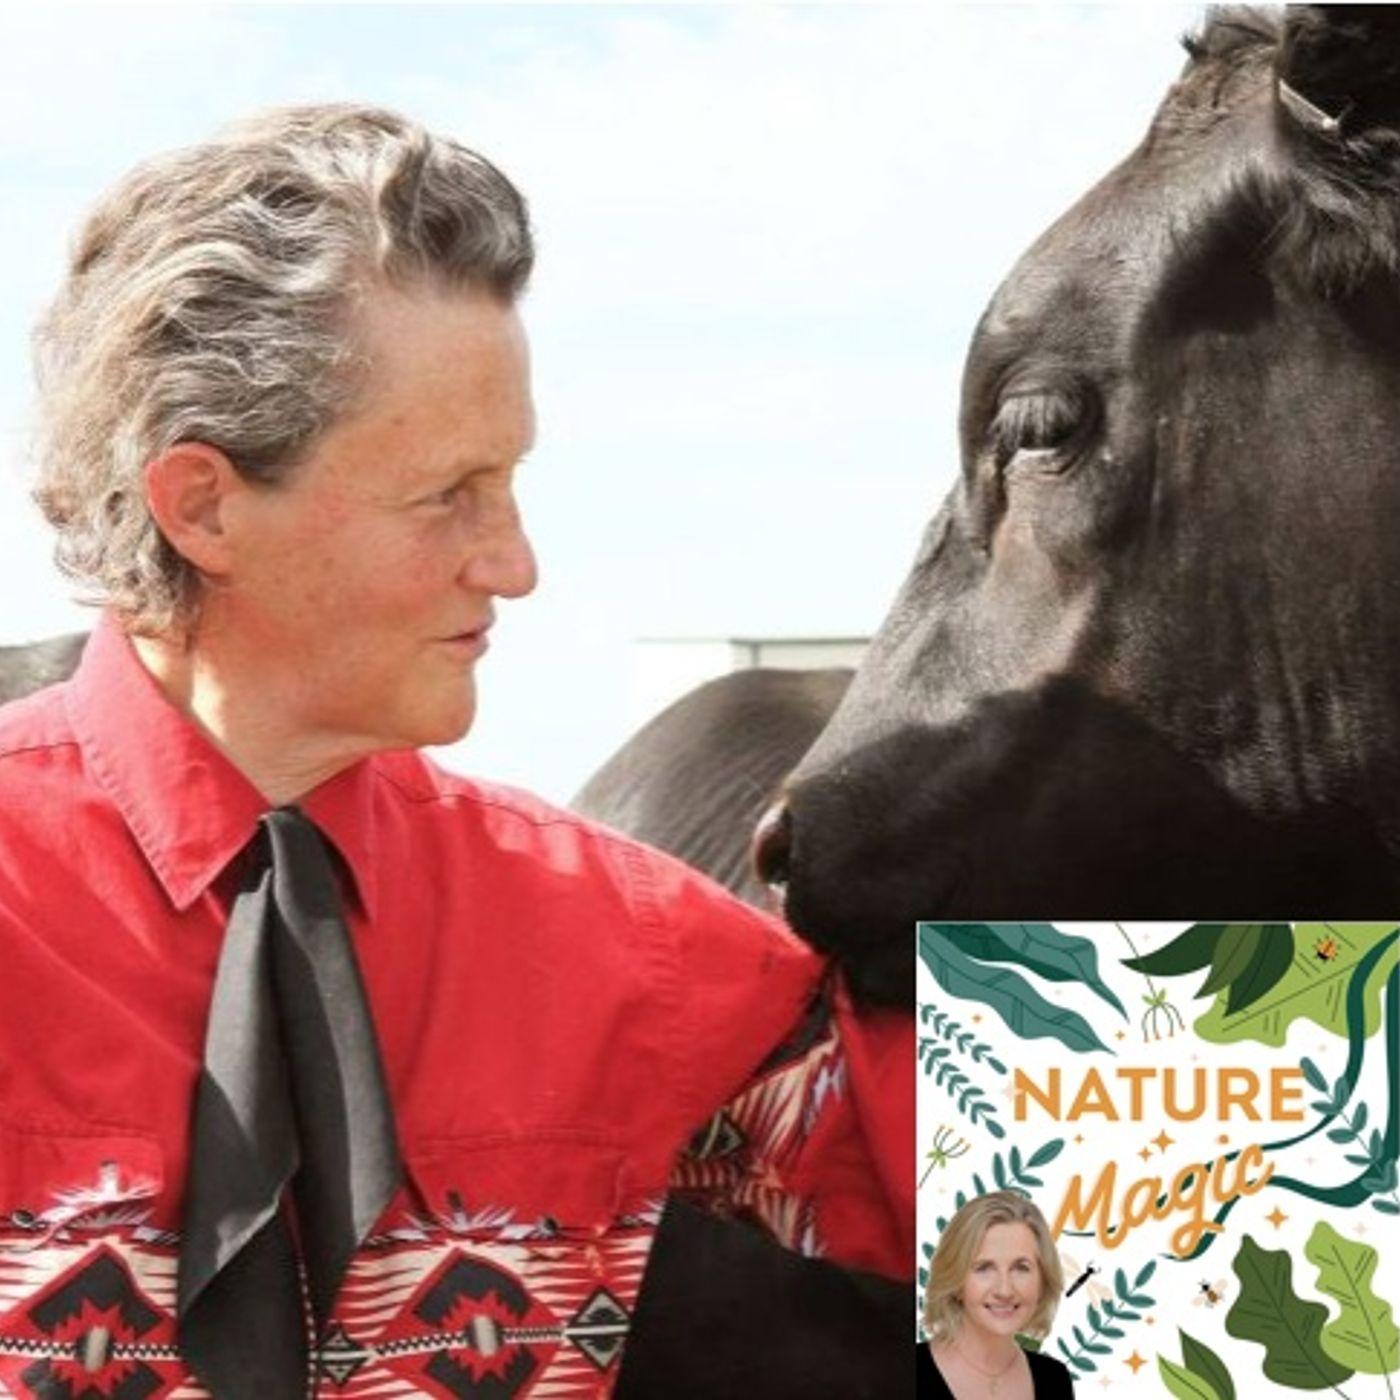 Episode 28 Professor Temple Grandin on the bovine mind